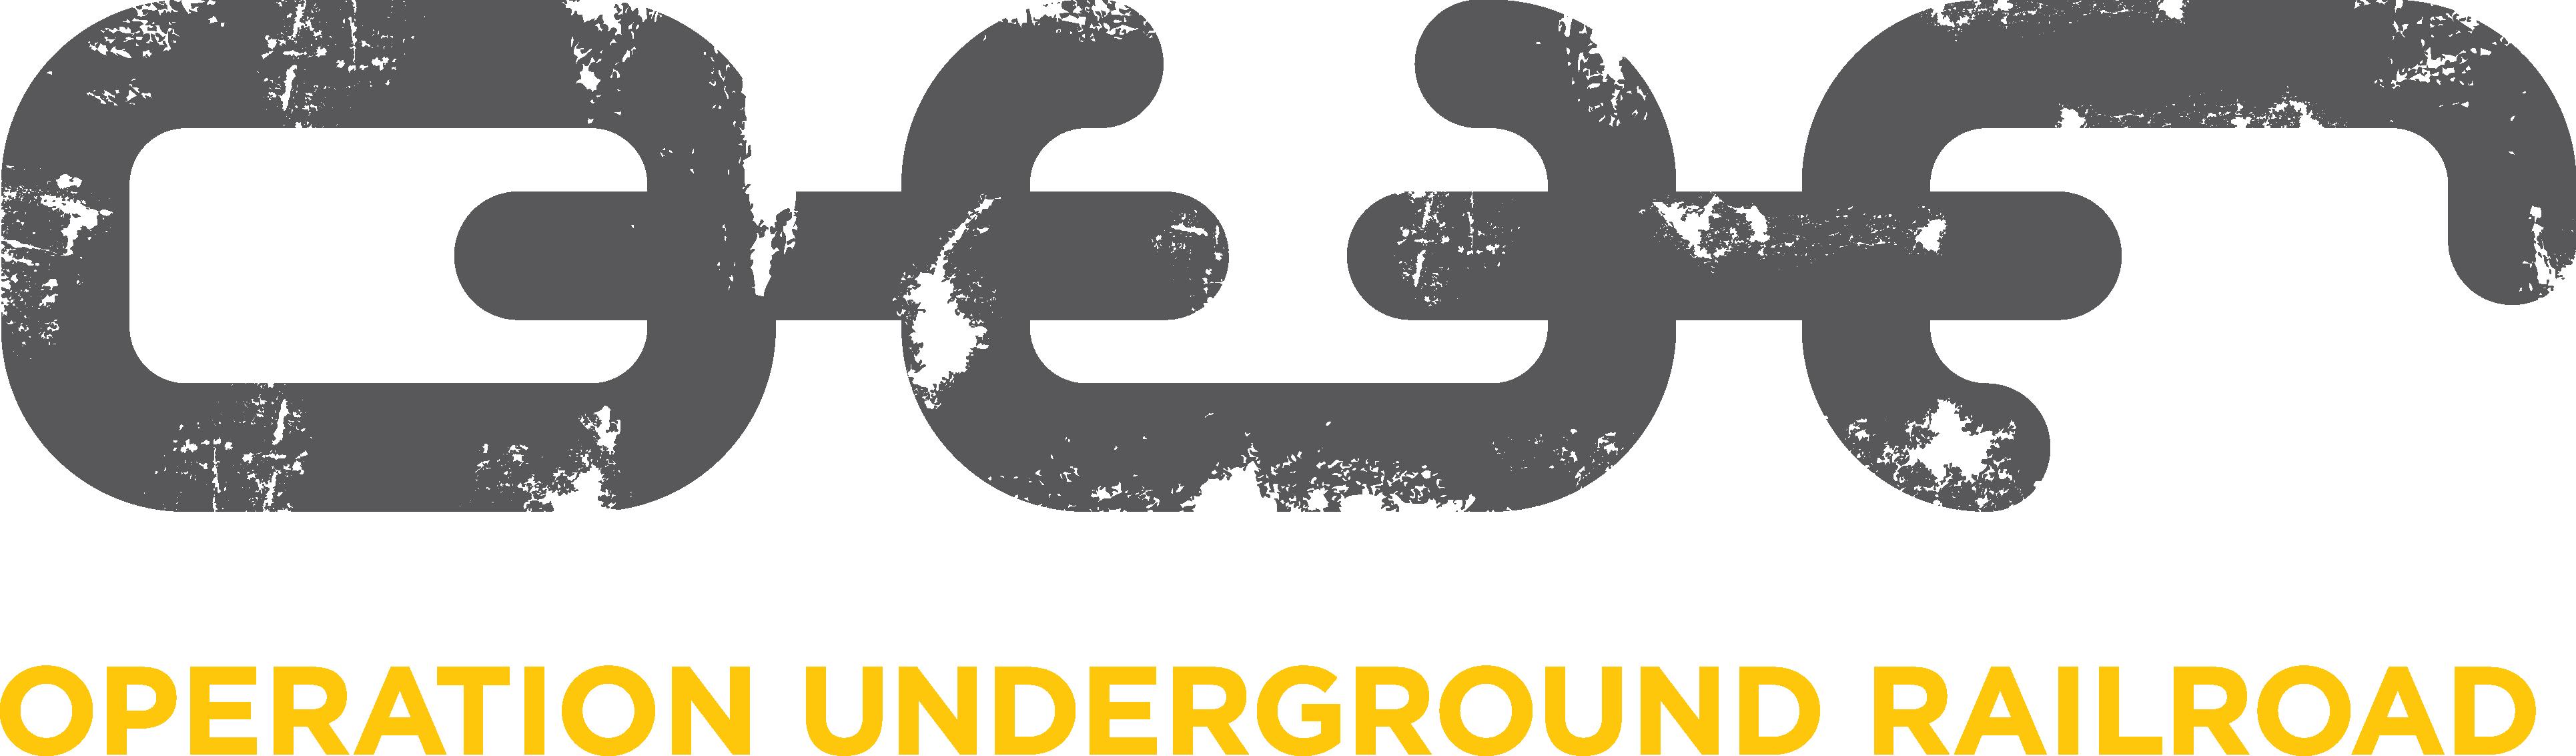 operation_underground_railroad_logo